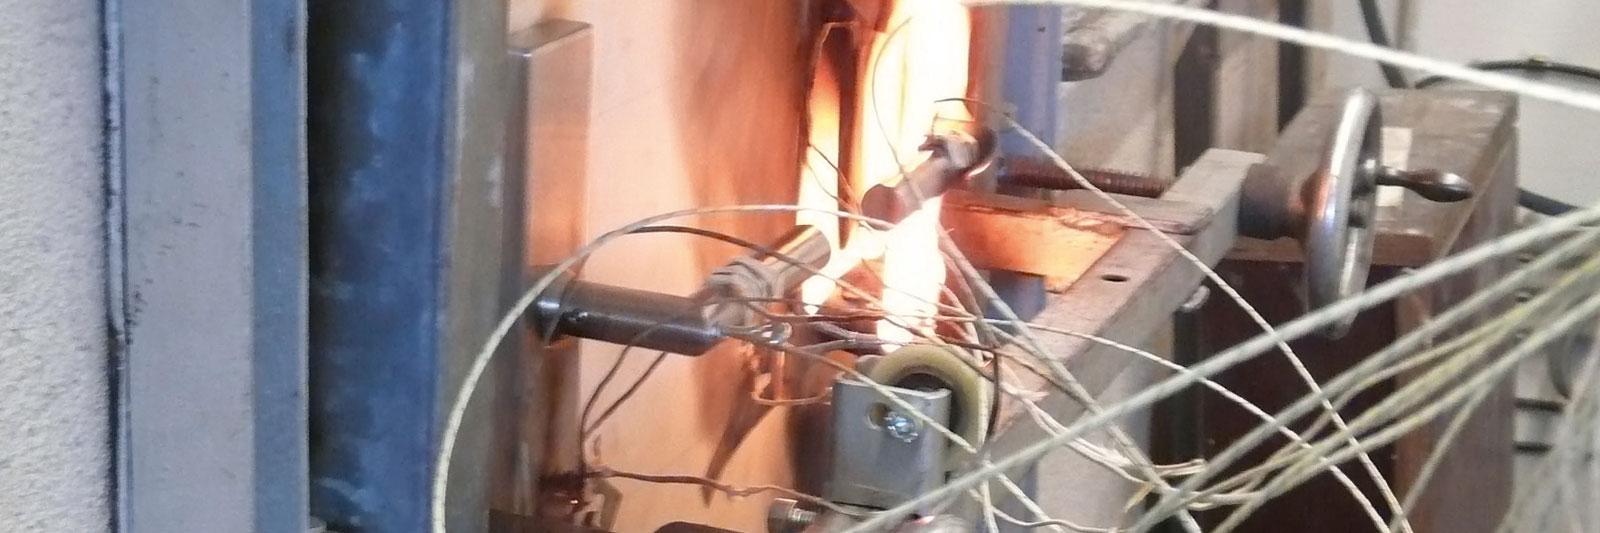 PfB Brandschutz